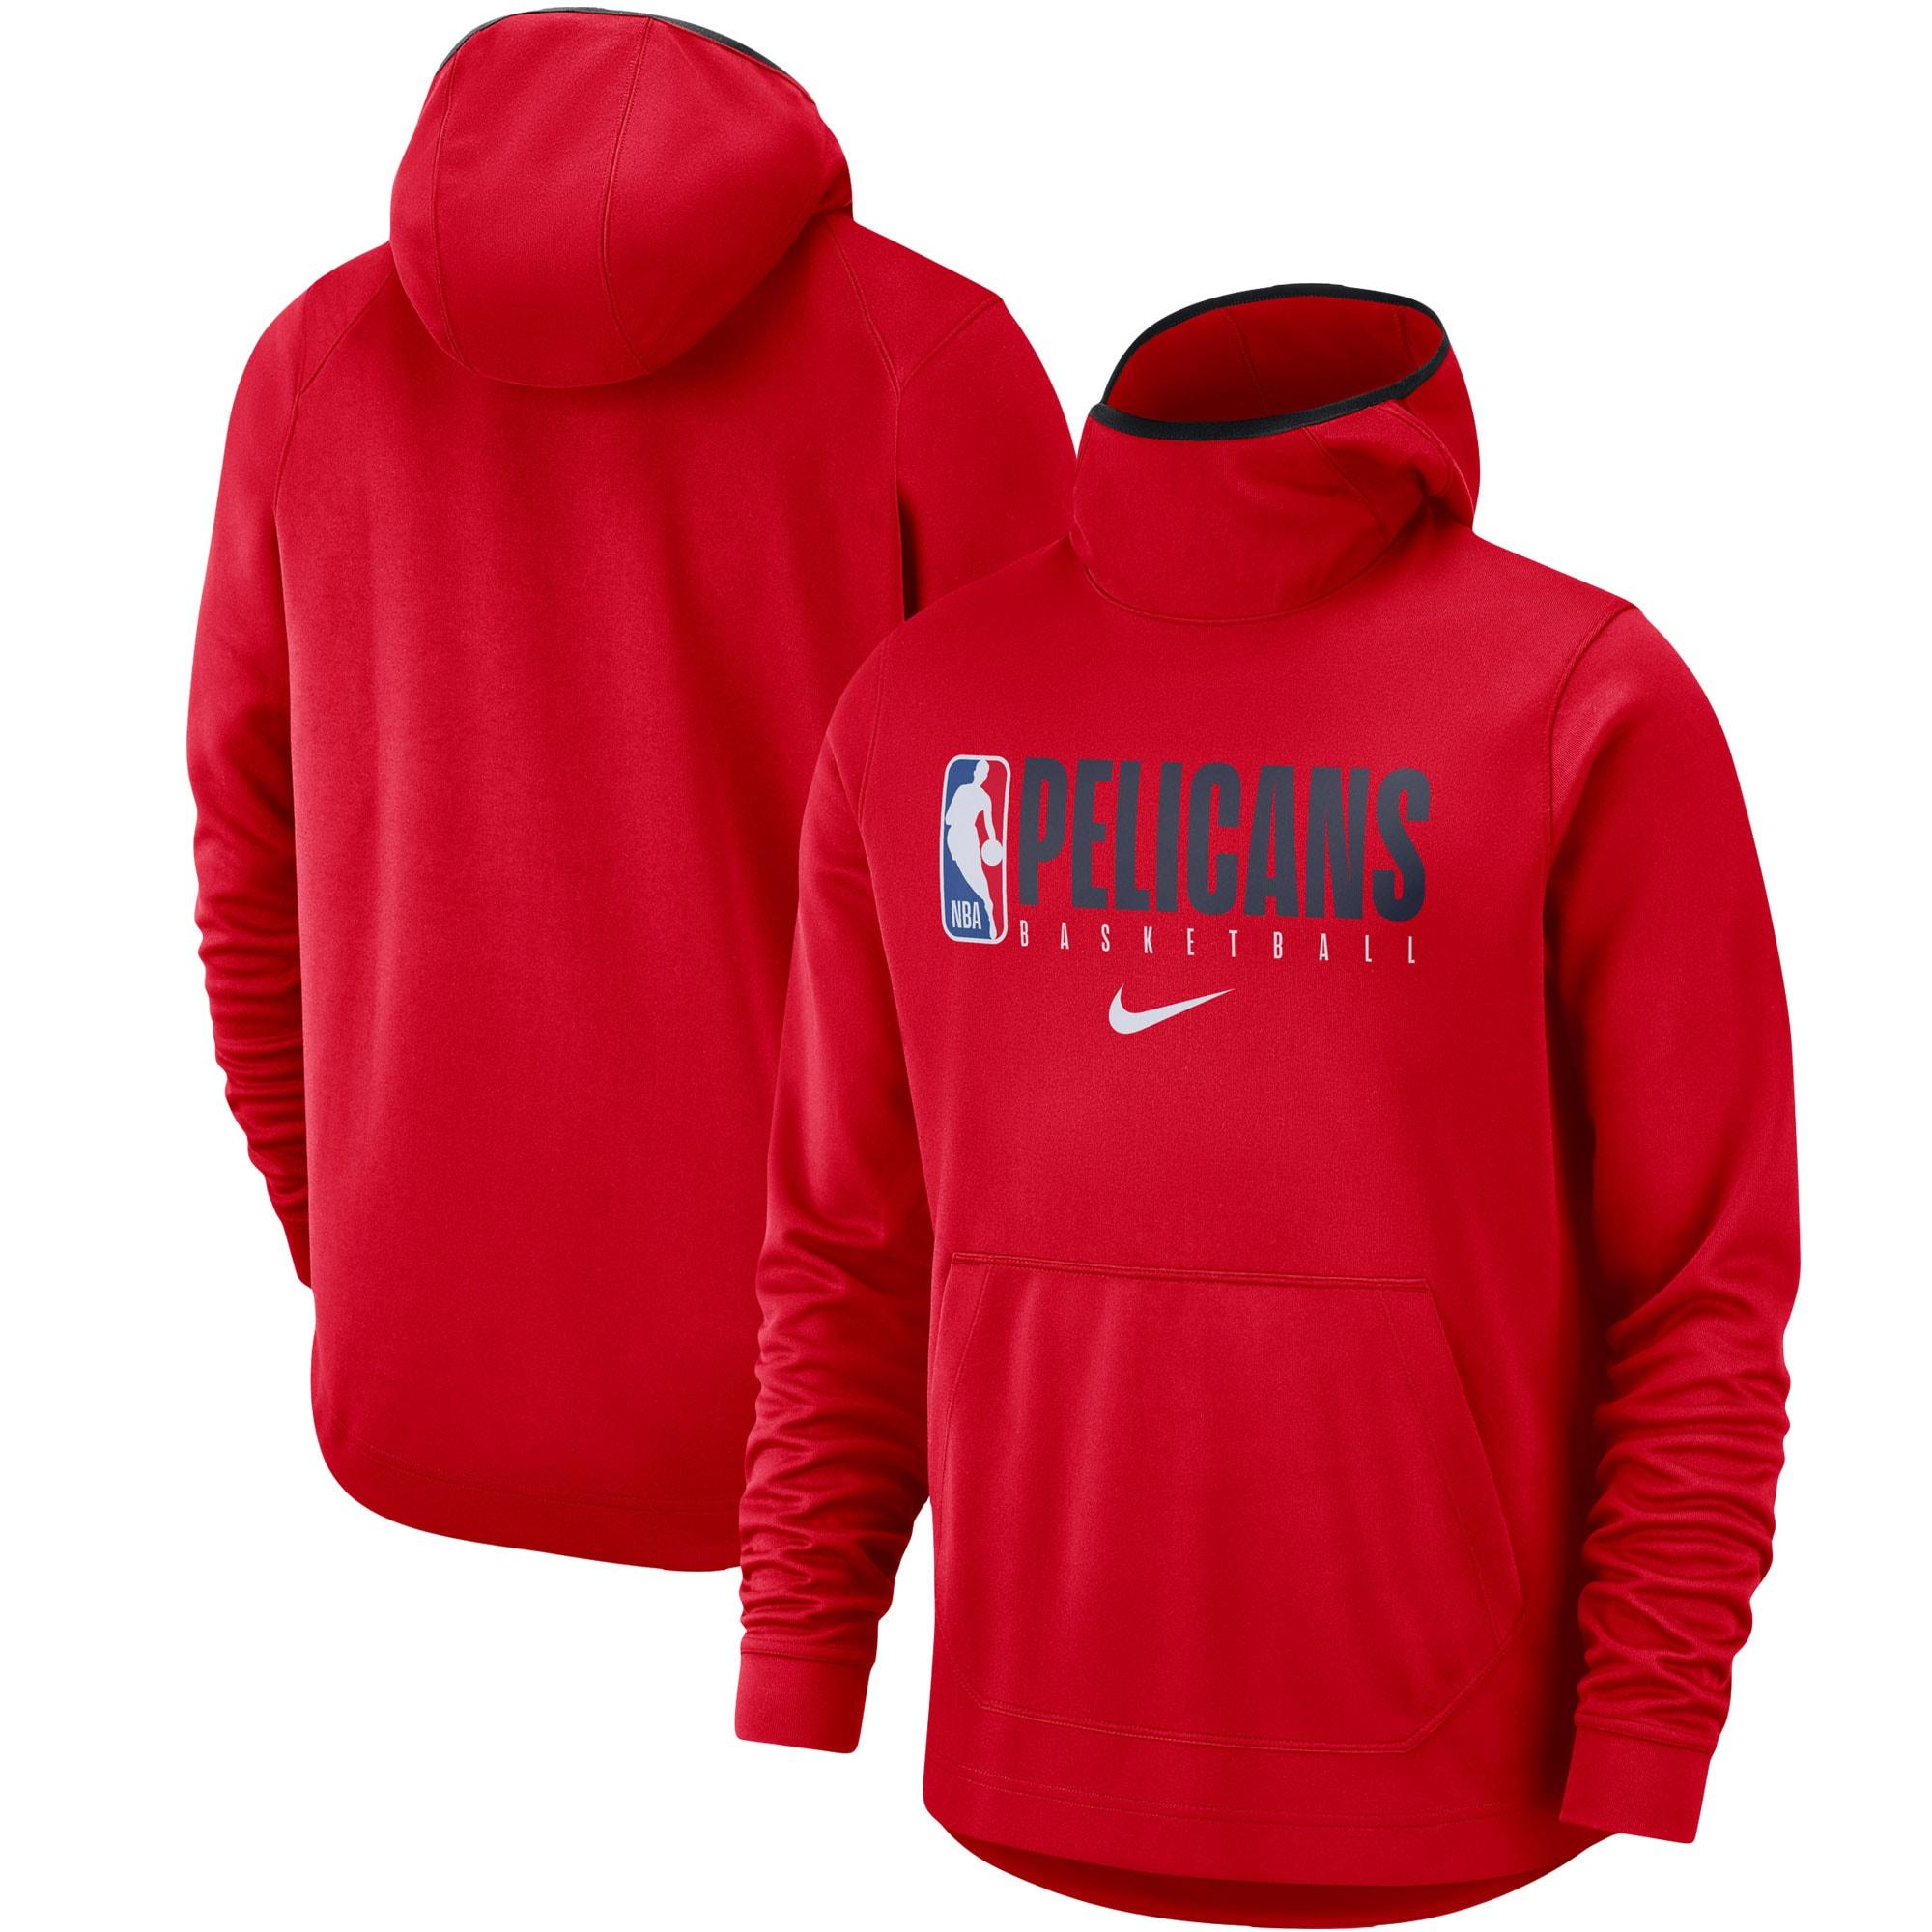 New Orleans Pelicans Nike Spotlight Practice Performance Pullover Hoodie - Red